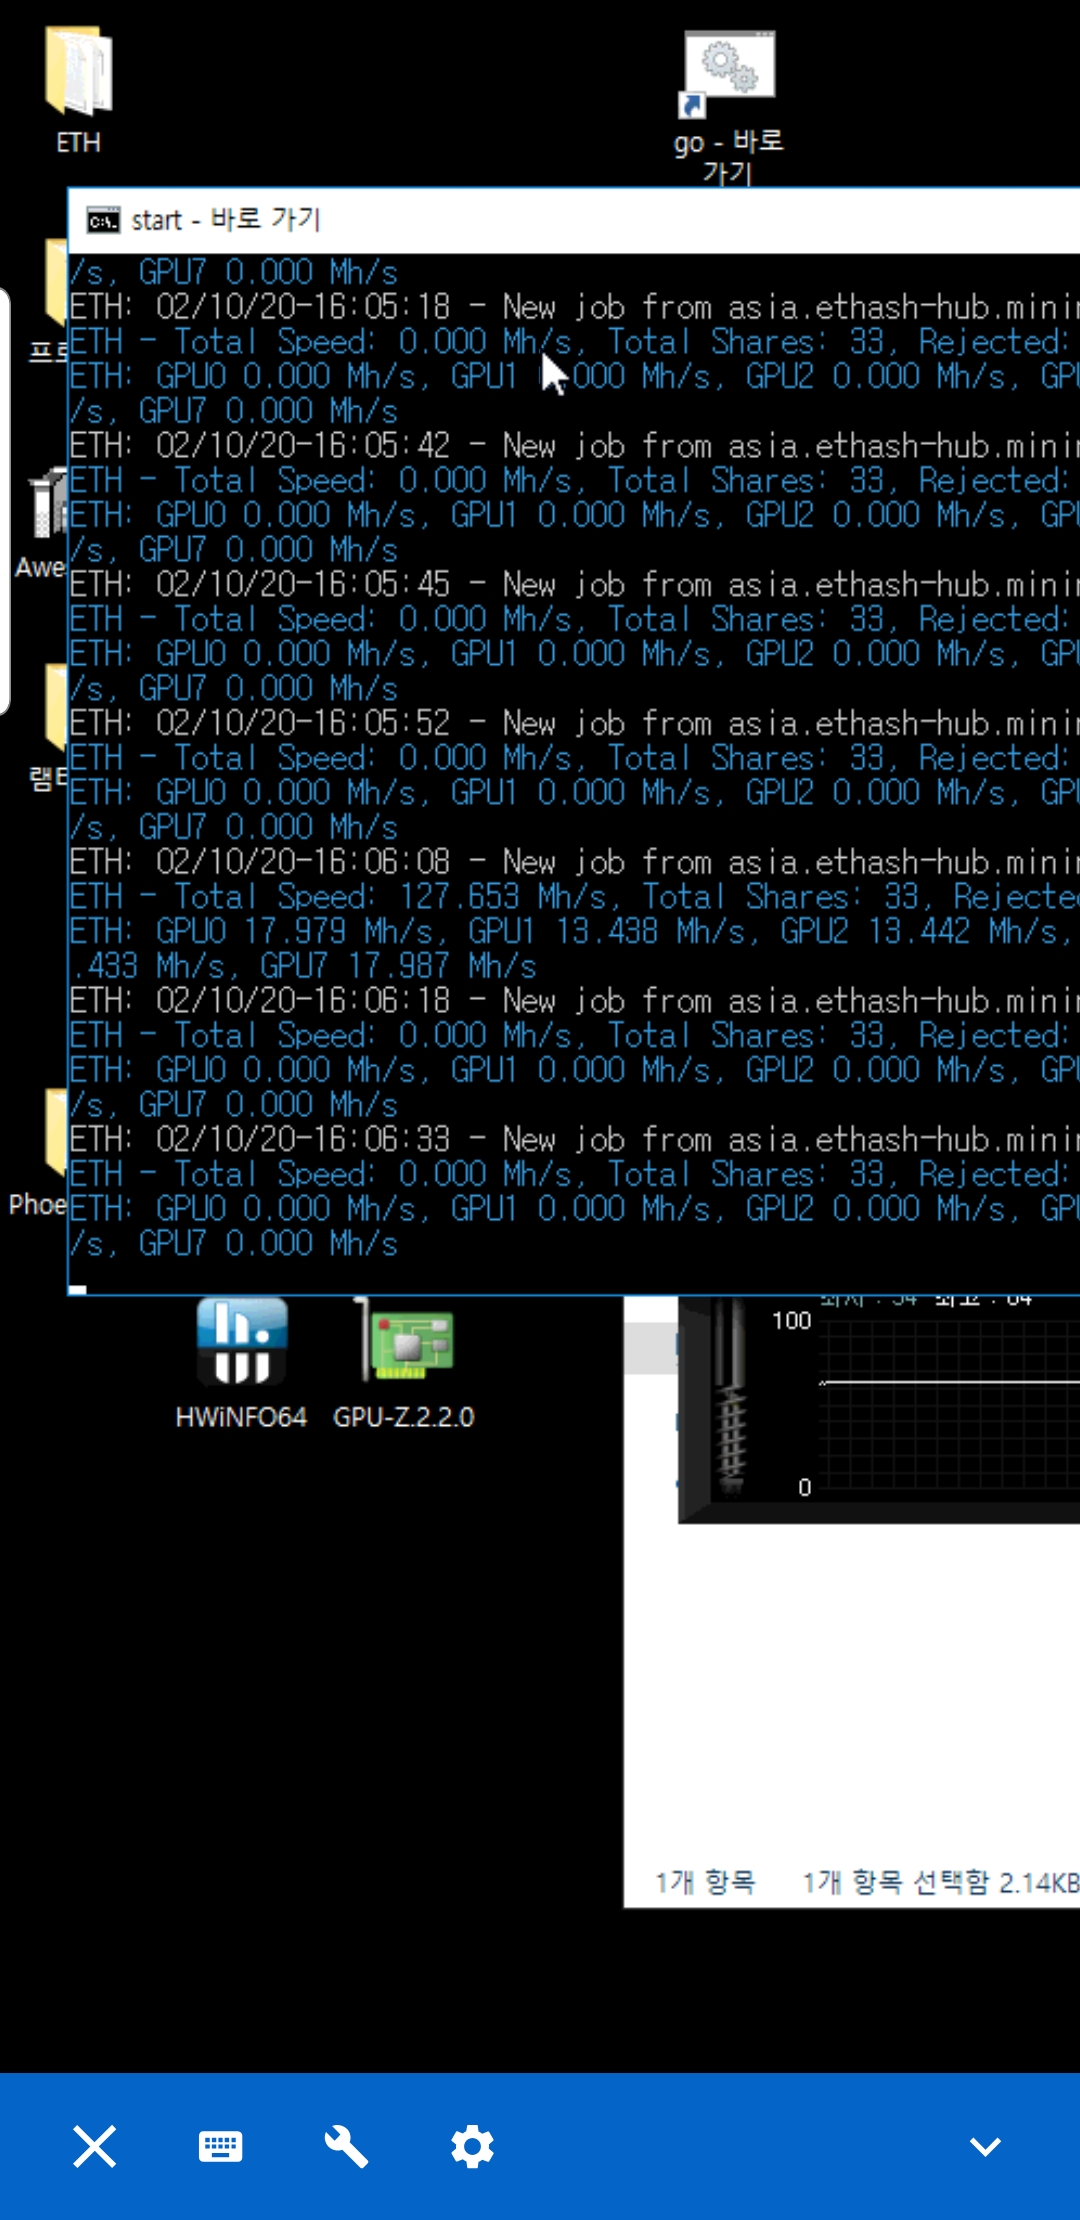 Screenshot_20200210-160652_TeamViewer.jpg